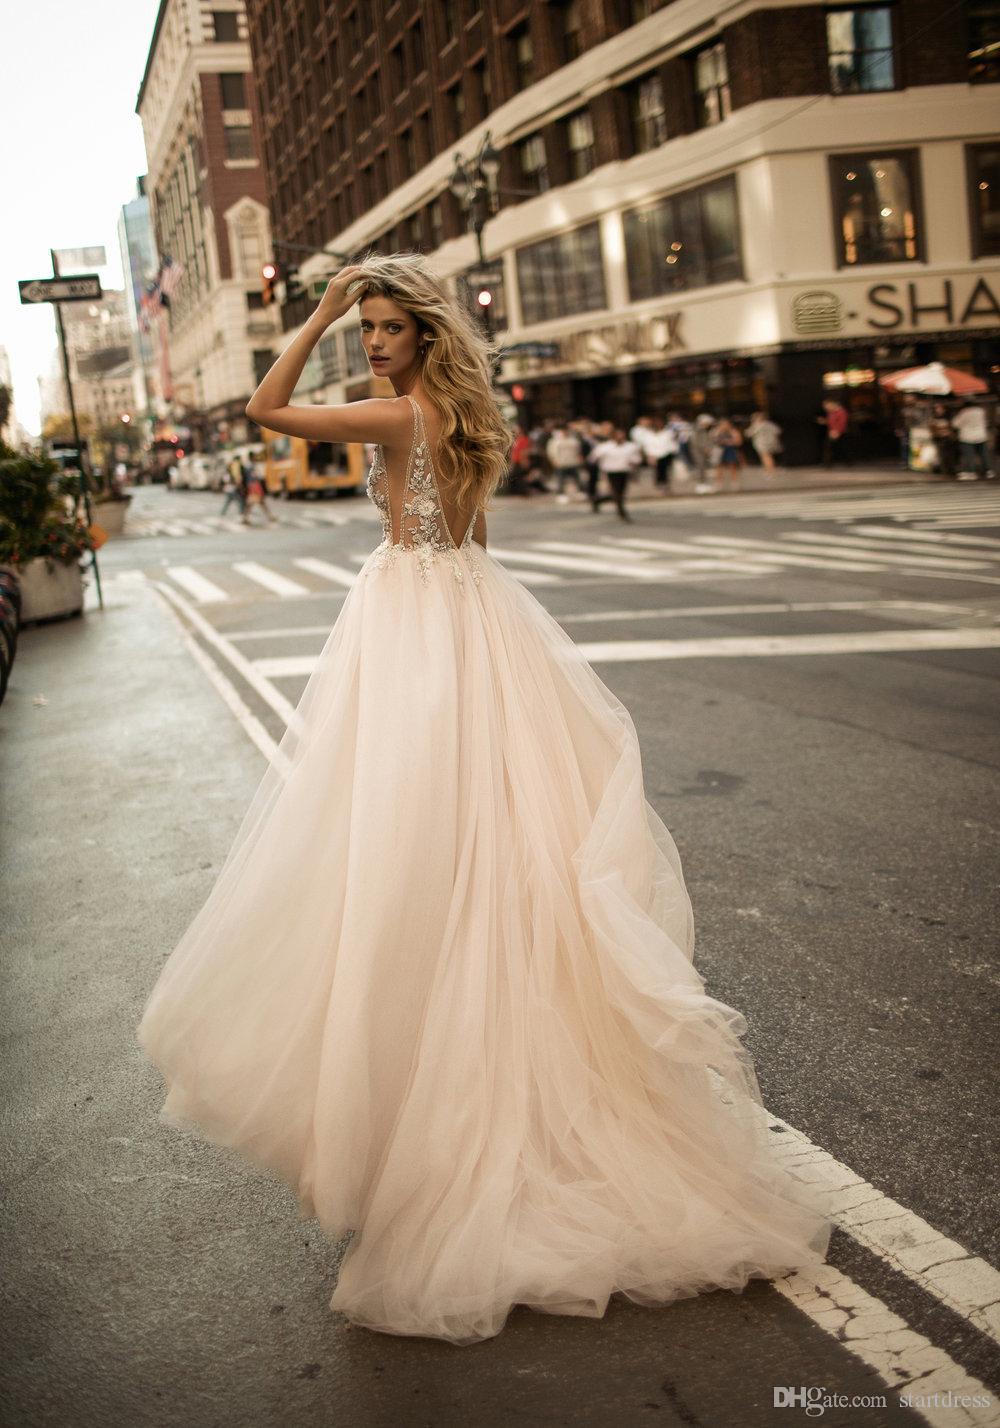 Amazing Designer Berta Bridal Top See Through 3d Floral Plugging Sexy Wedding Dresses Open Back Garden Cheap Country Gothic robe de mariée